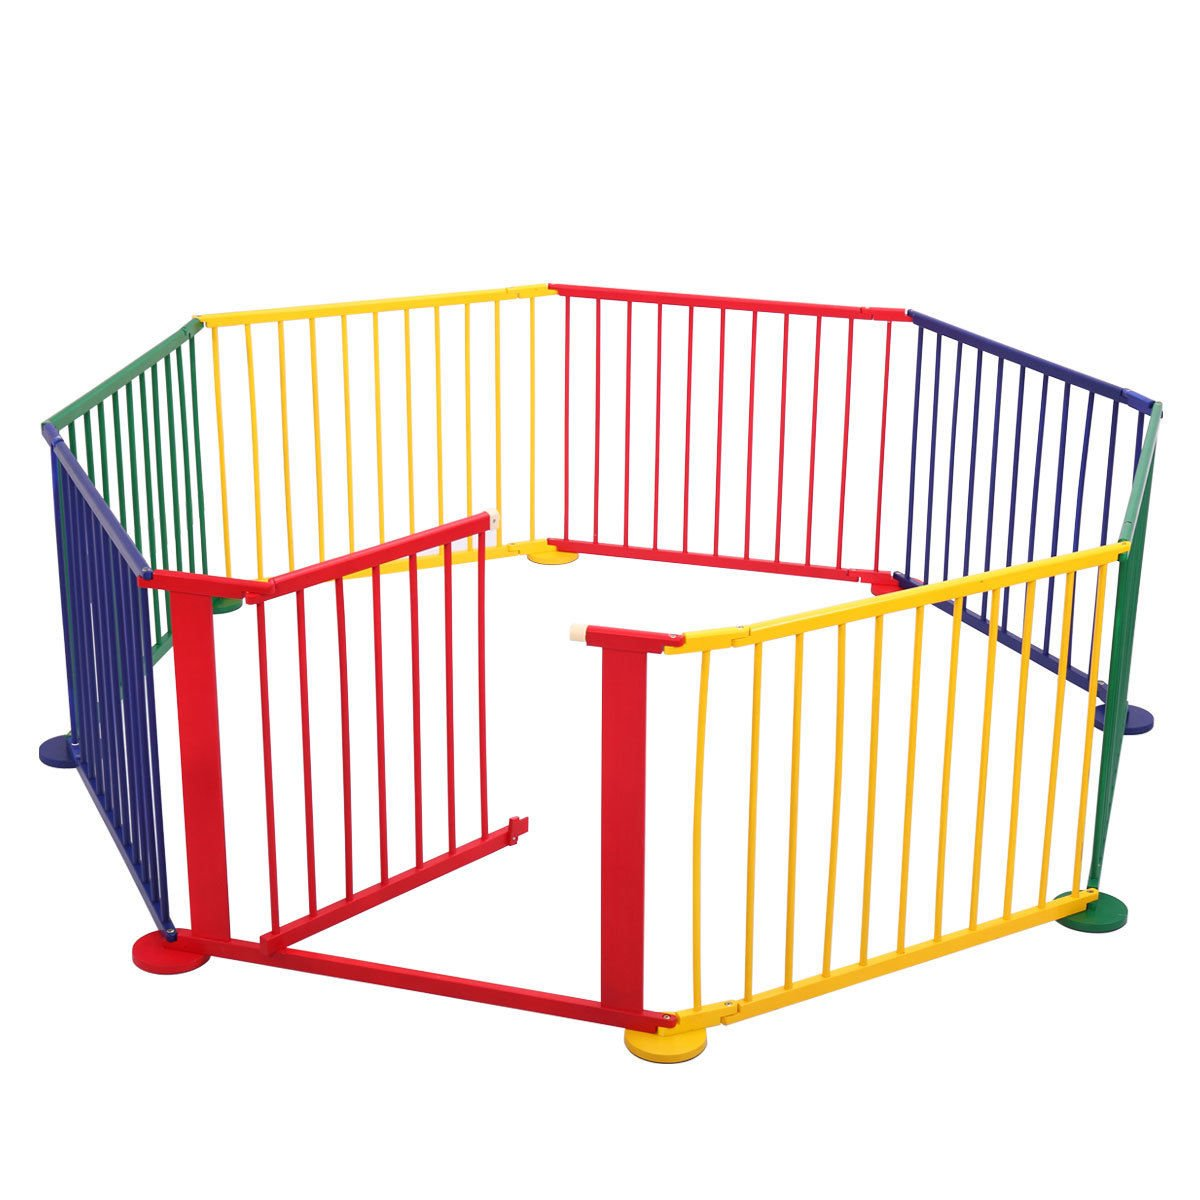 Amazon Com Jaxpety 8 Panel Kids Play Center Yard Indoor Outdoor